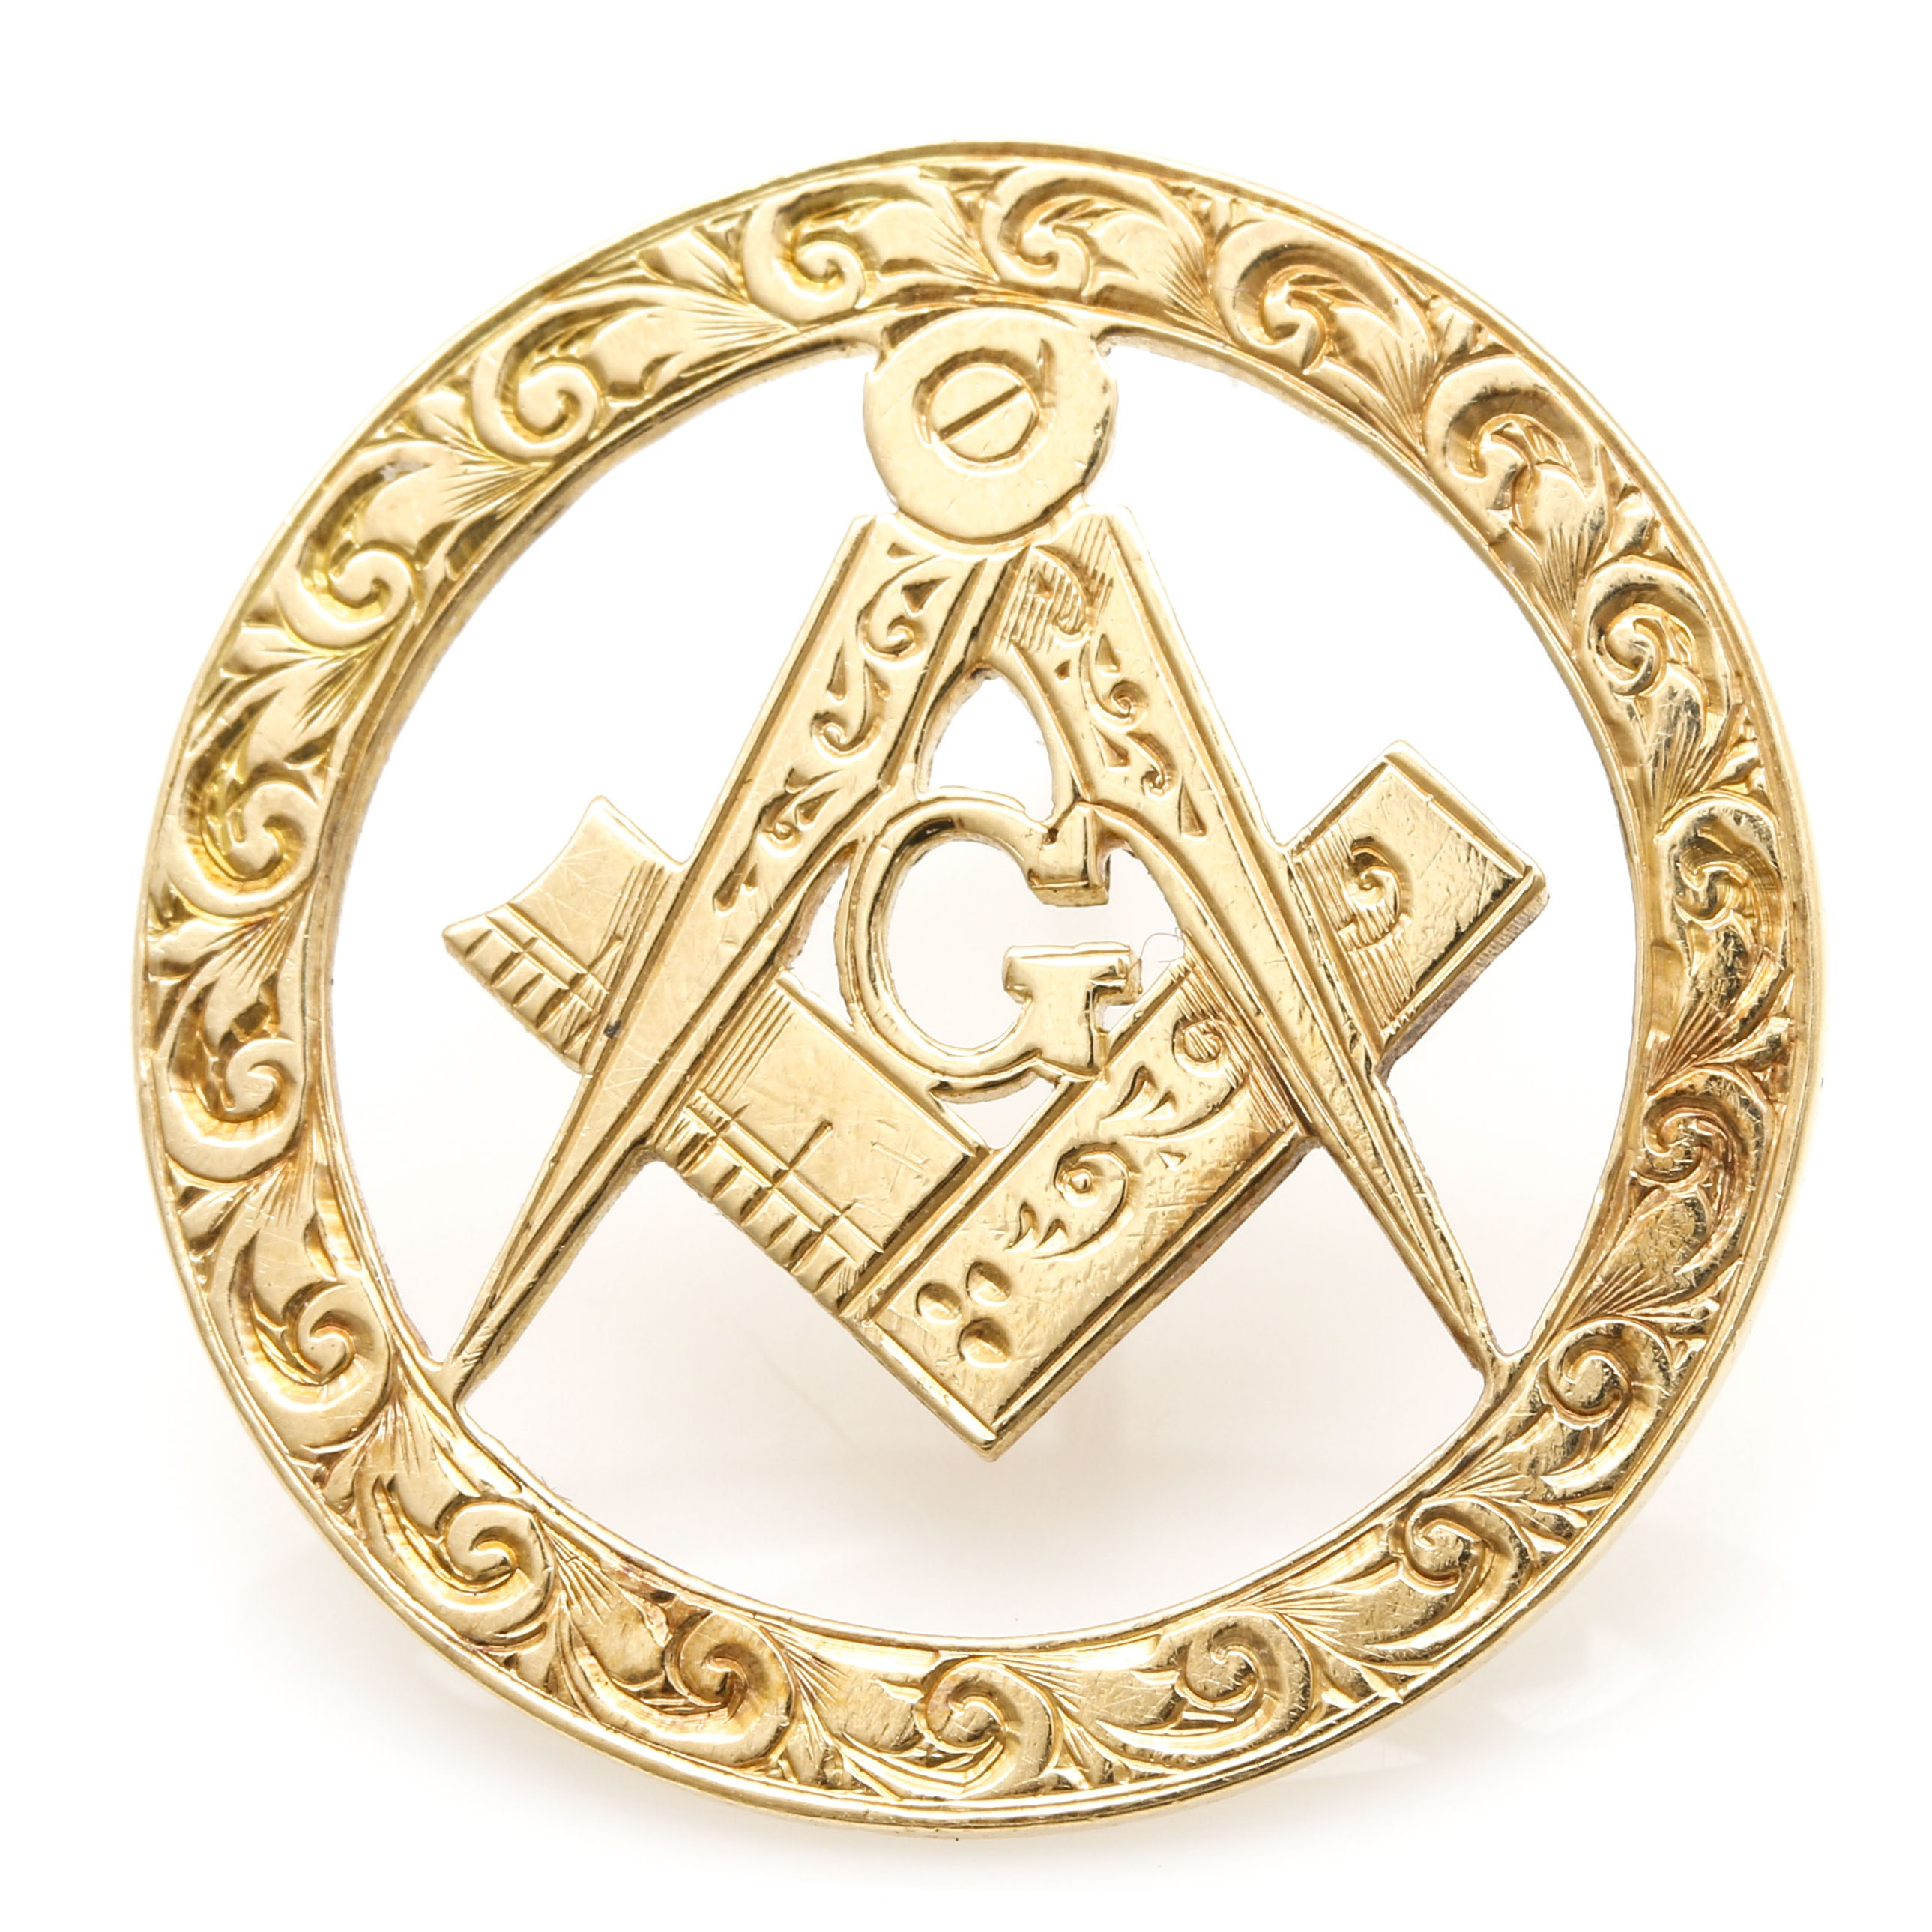 18K Yellow Gold Hand Engraved Freemasonry Lapel Pin